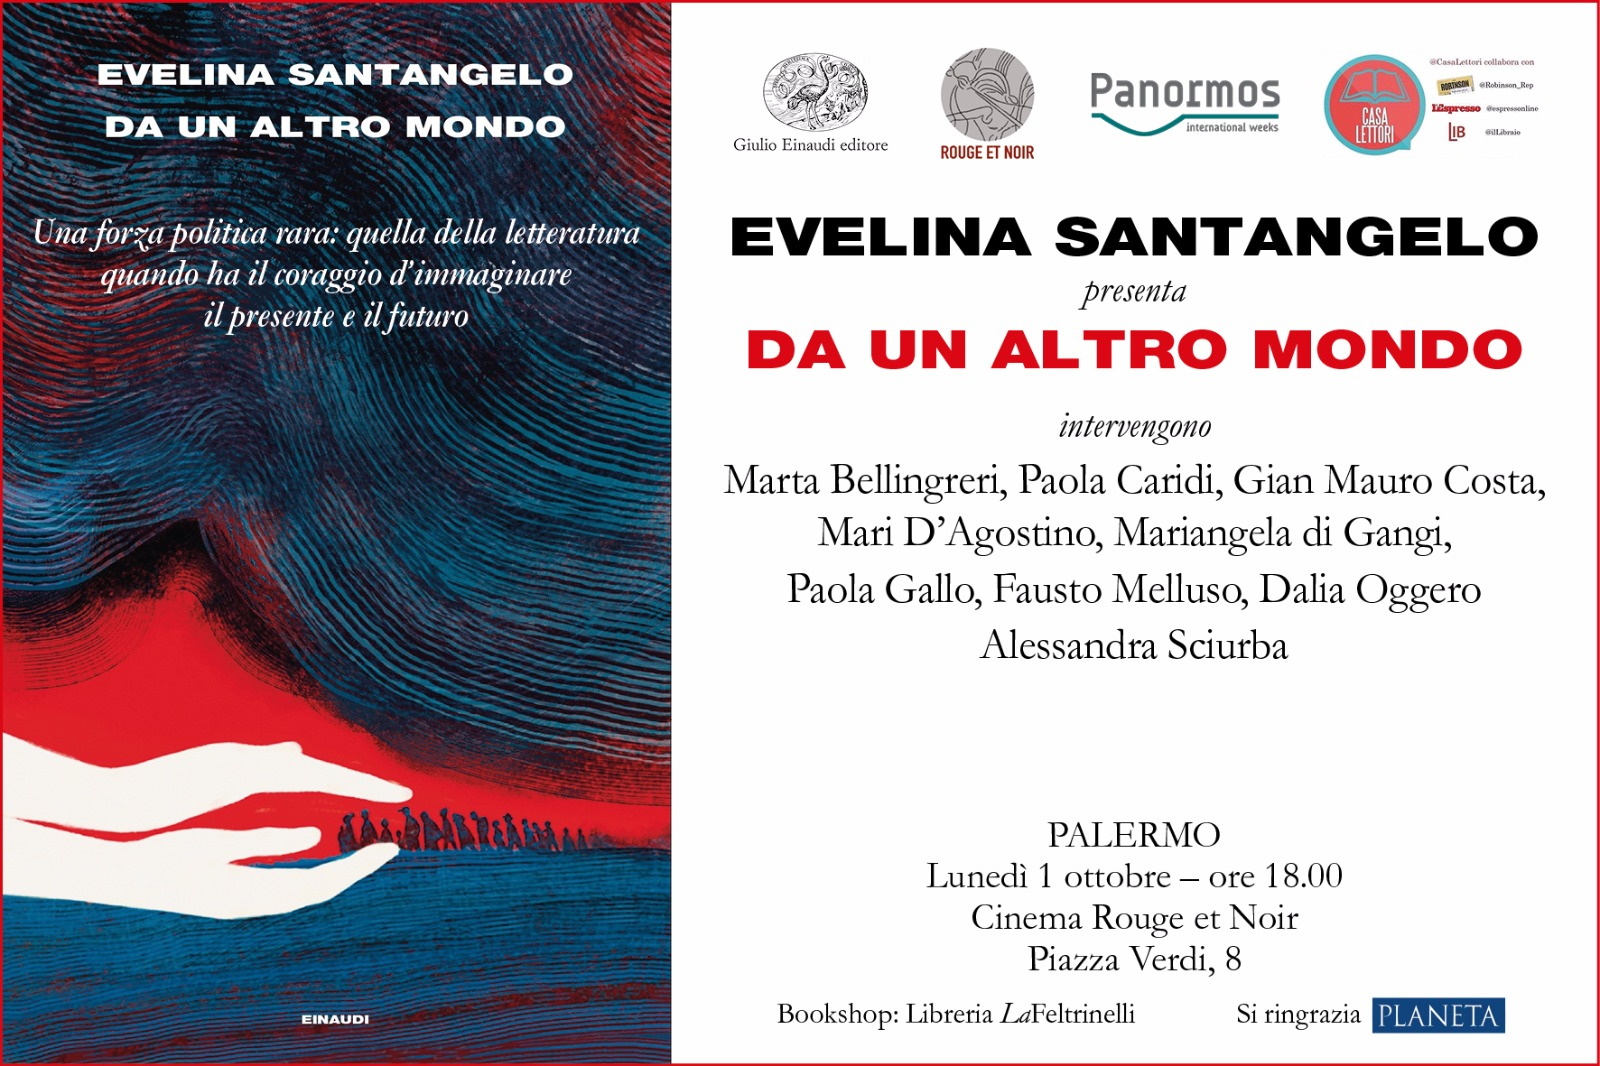 2018_Evelina_Santangelo_riceviamo.jpeg - 415.14 kB